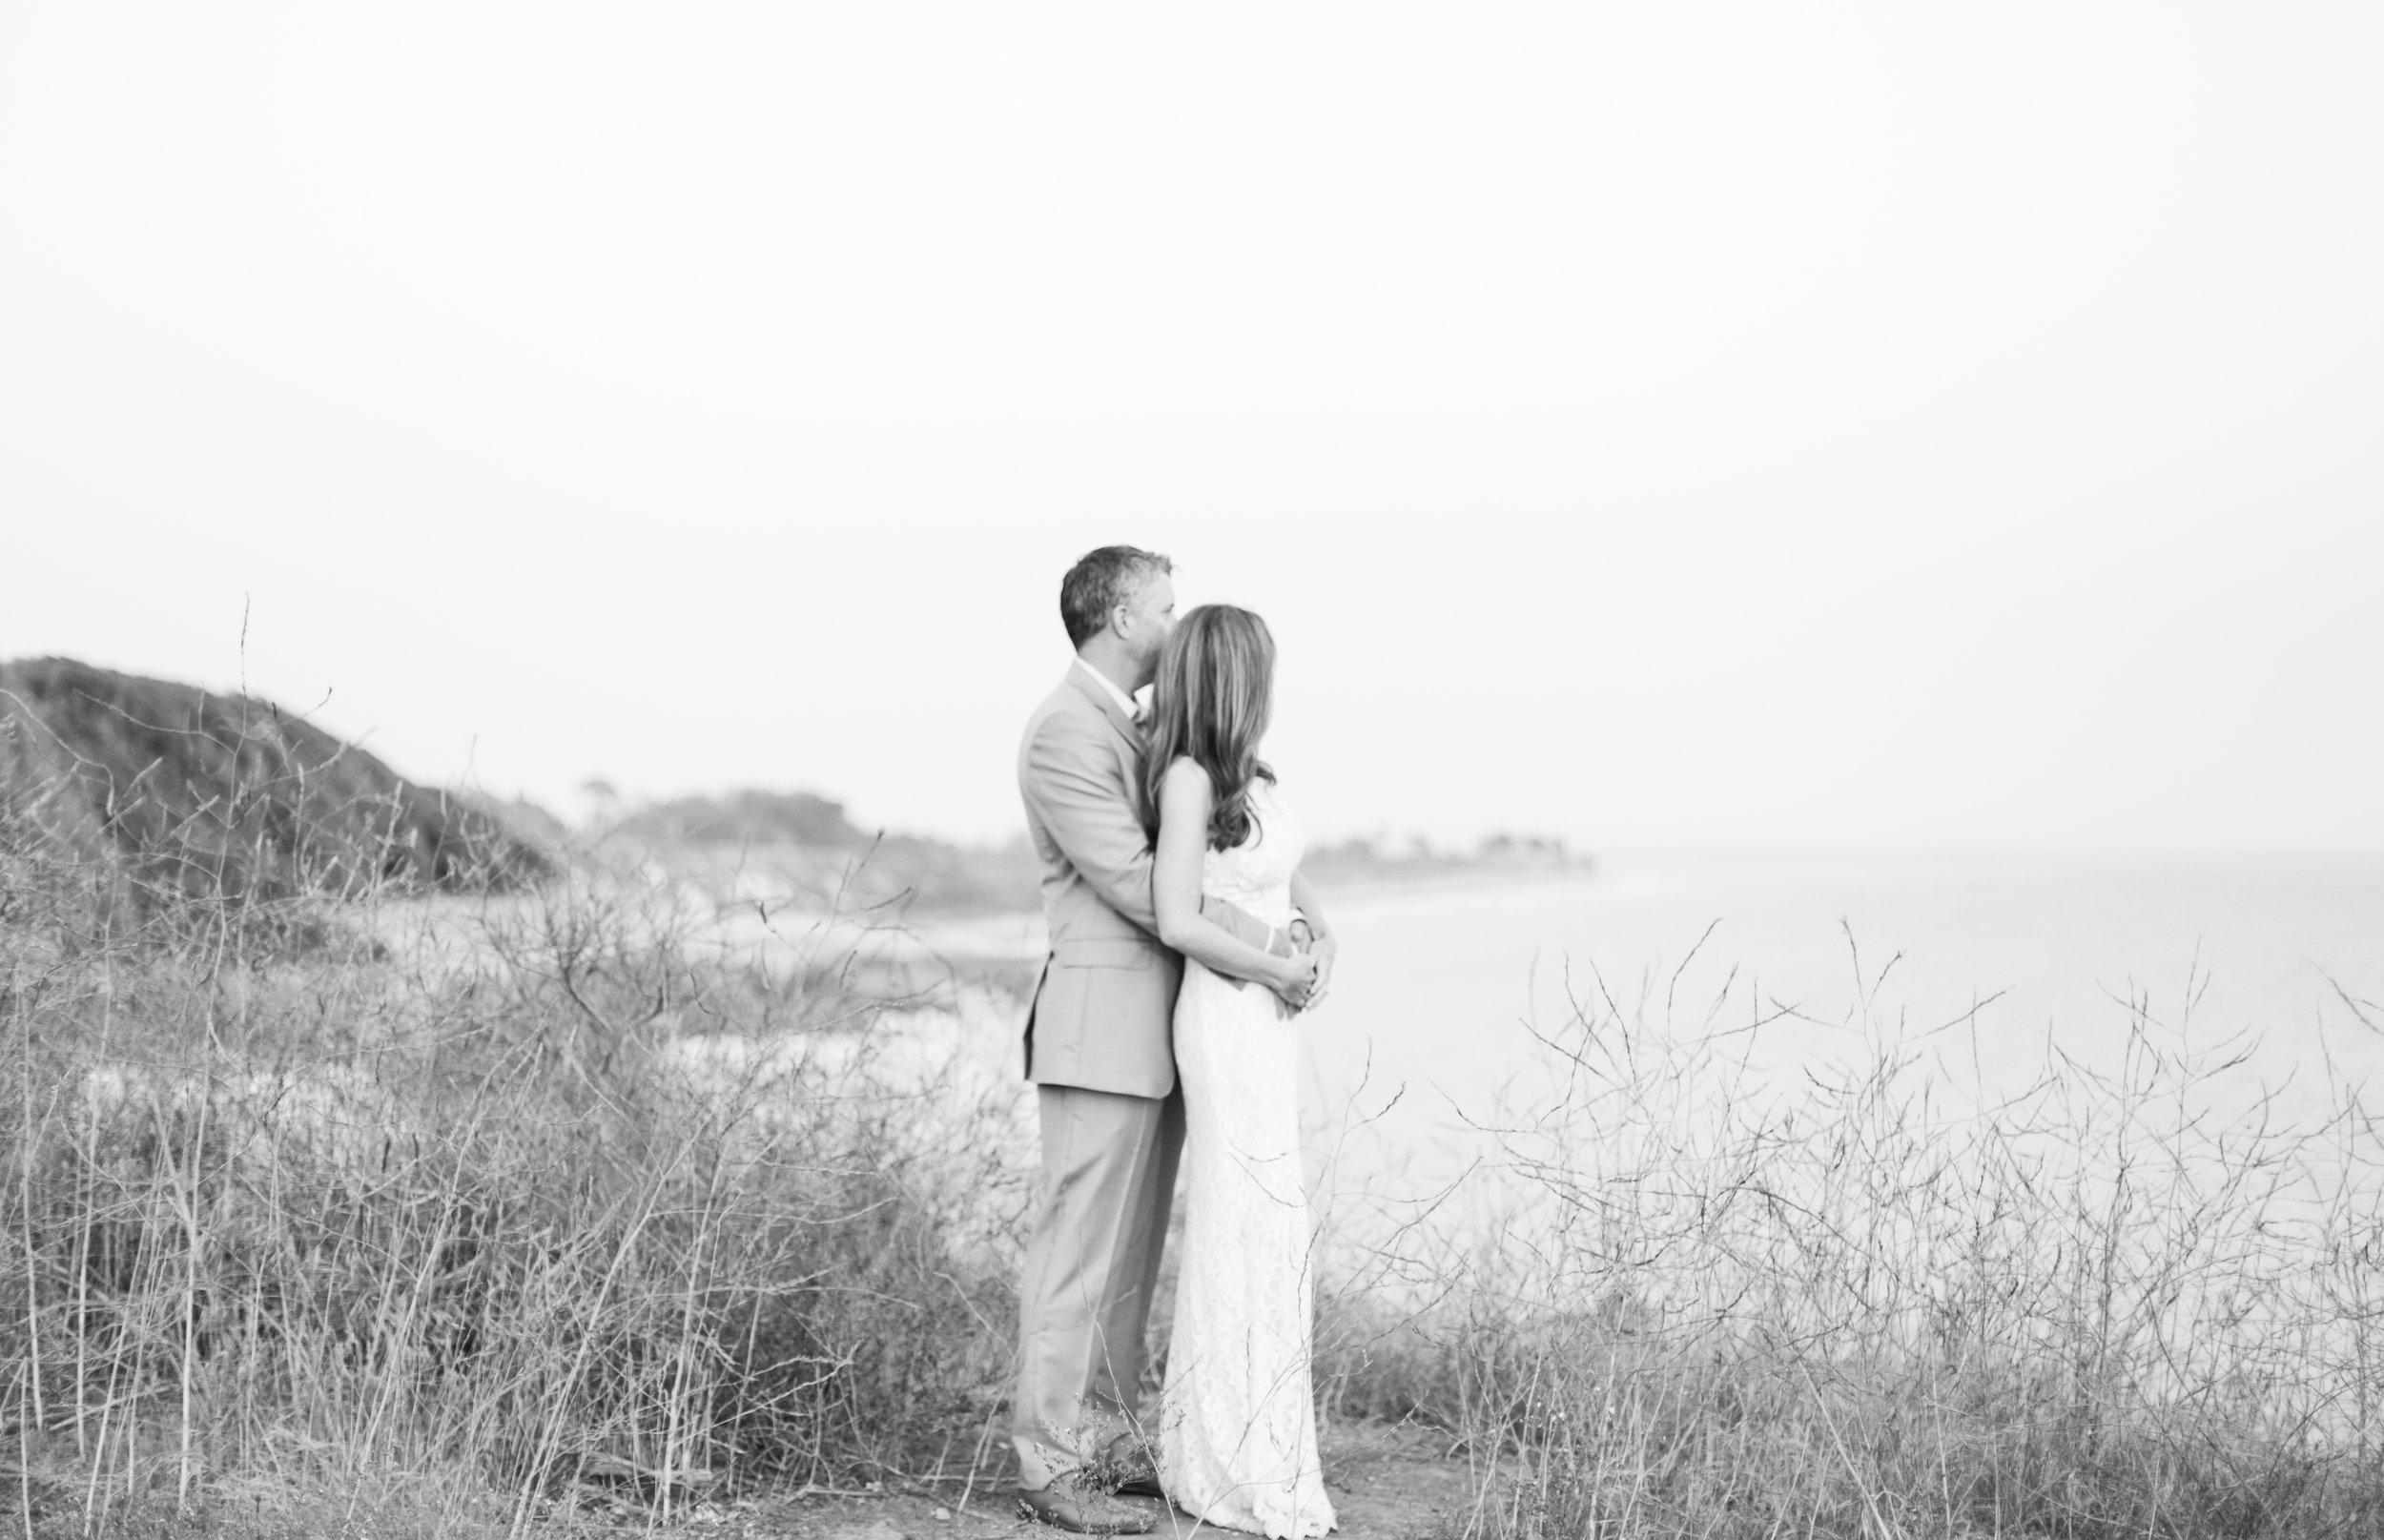 santa-barbara-elopement-elope-wedding-planner-coordinator-coordination-day-of-intimate-rustic-ellwood-bluffs-forest-beach-ocean-view-green-white-event (19).jpg